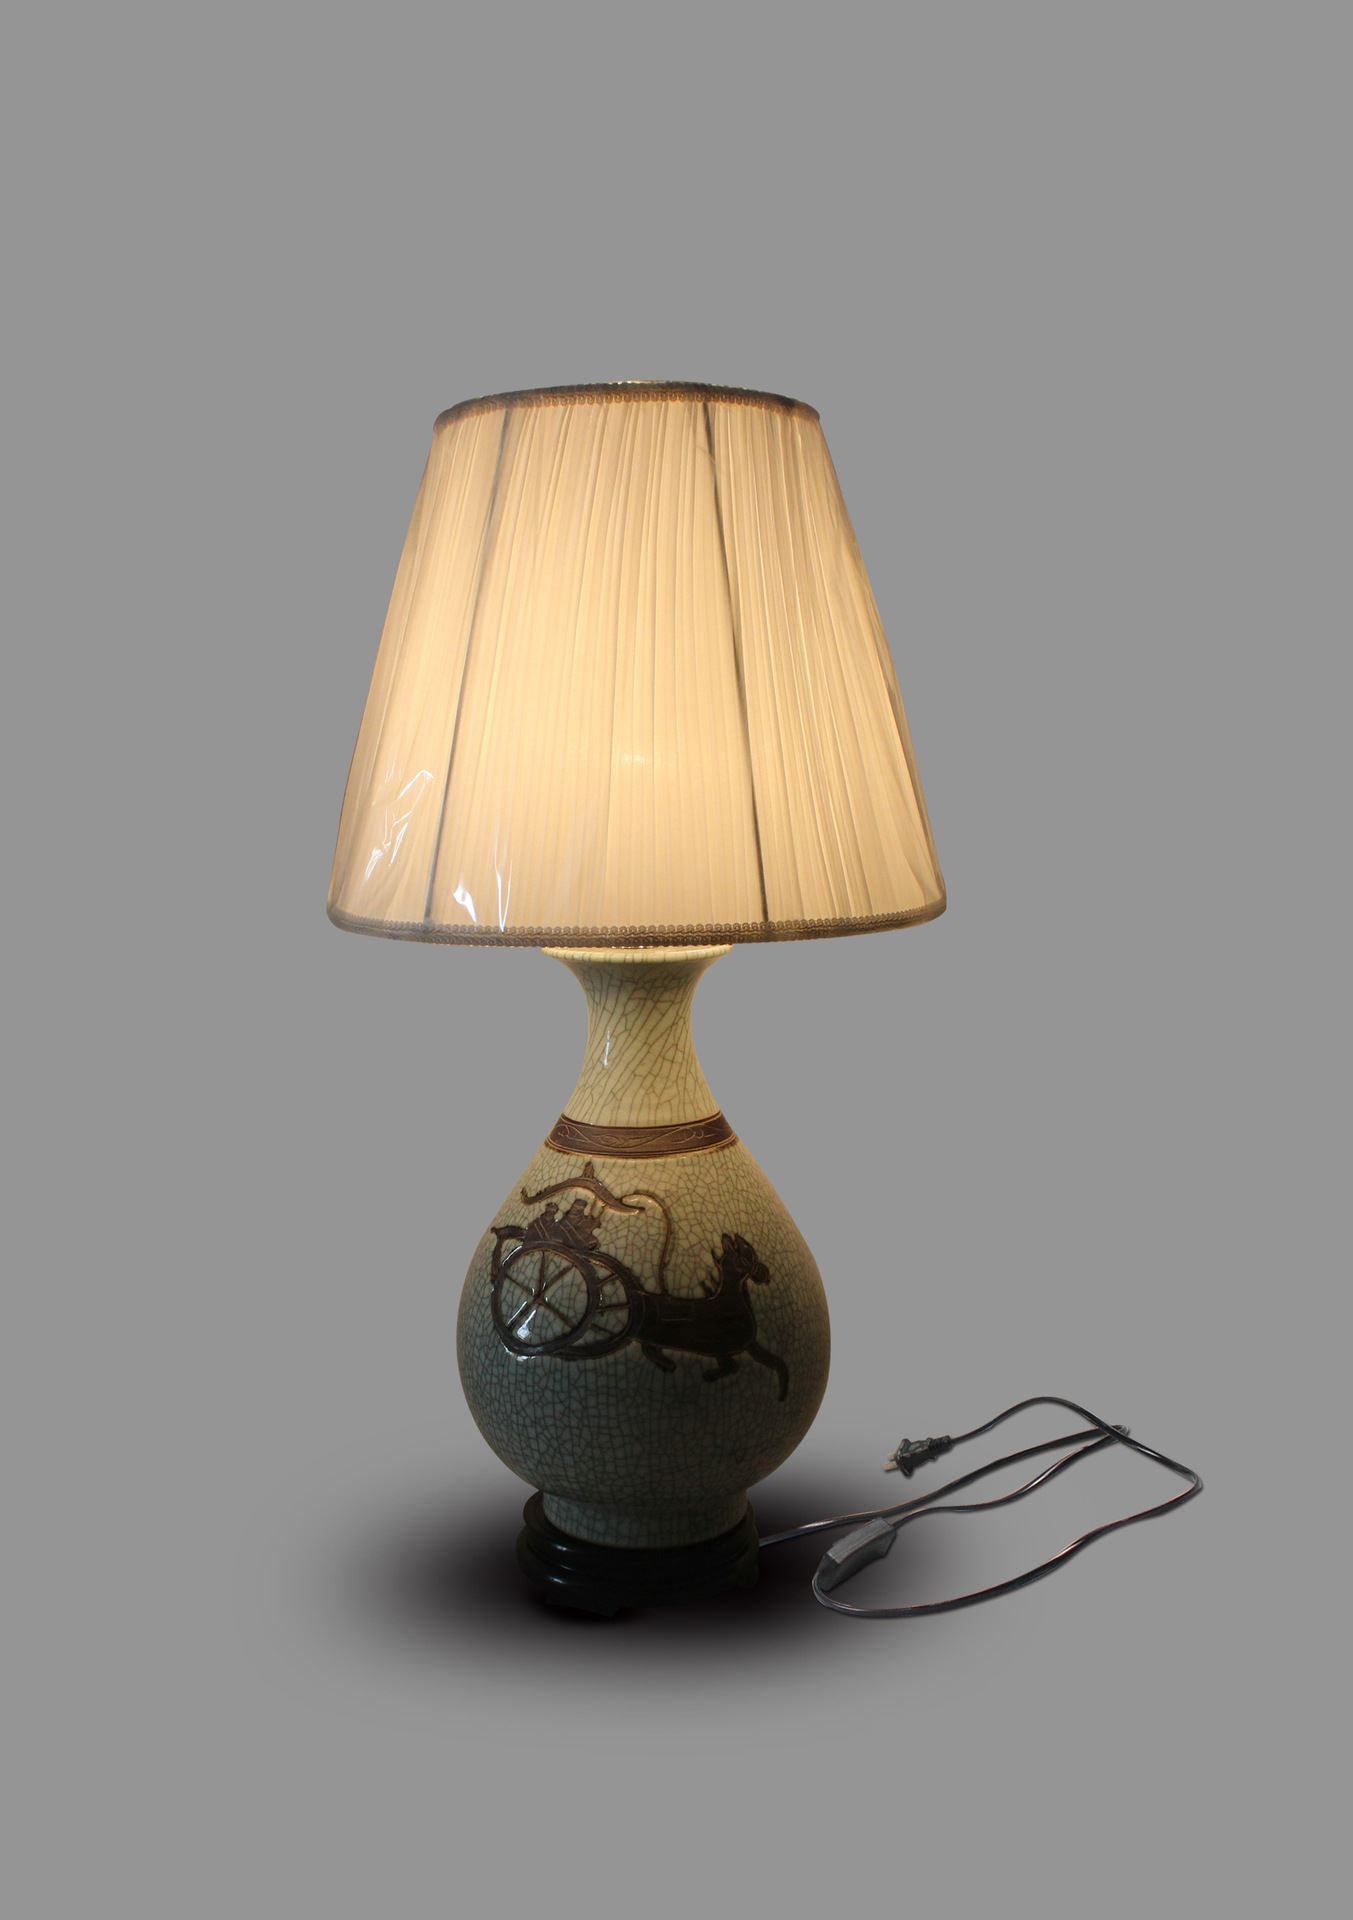 DSIF06景德镇 陶瓷 开片雕刻人马 台灯 灯具 灯饰 家居摆设